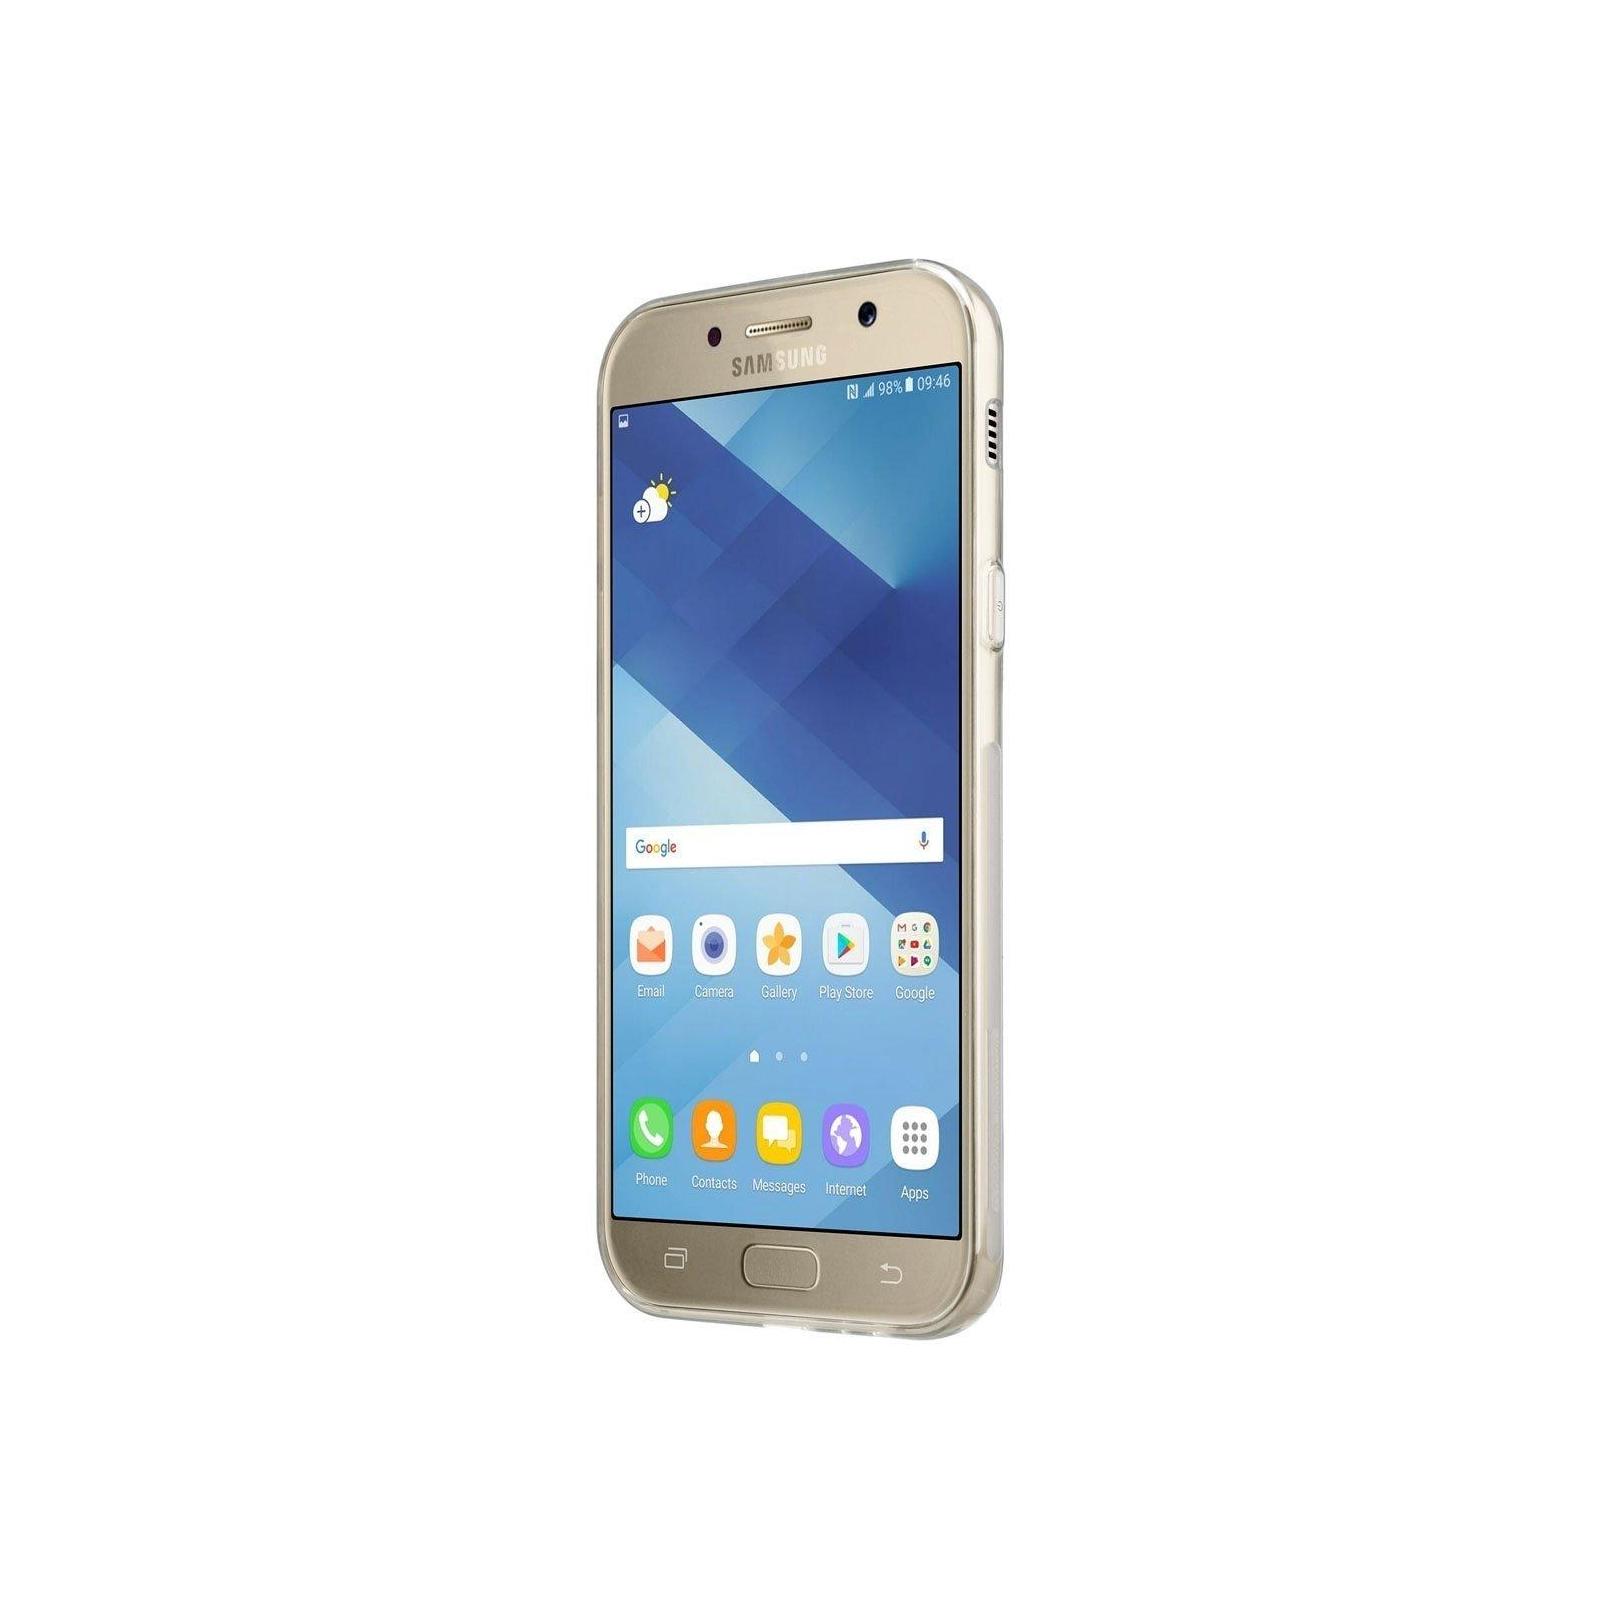 Чехол для моб. телефона SmartCase Samsung Galaxy A3 /A320 TPU Clear (SC-A3) изображение 2